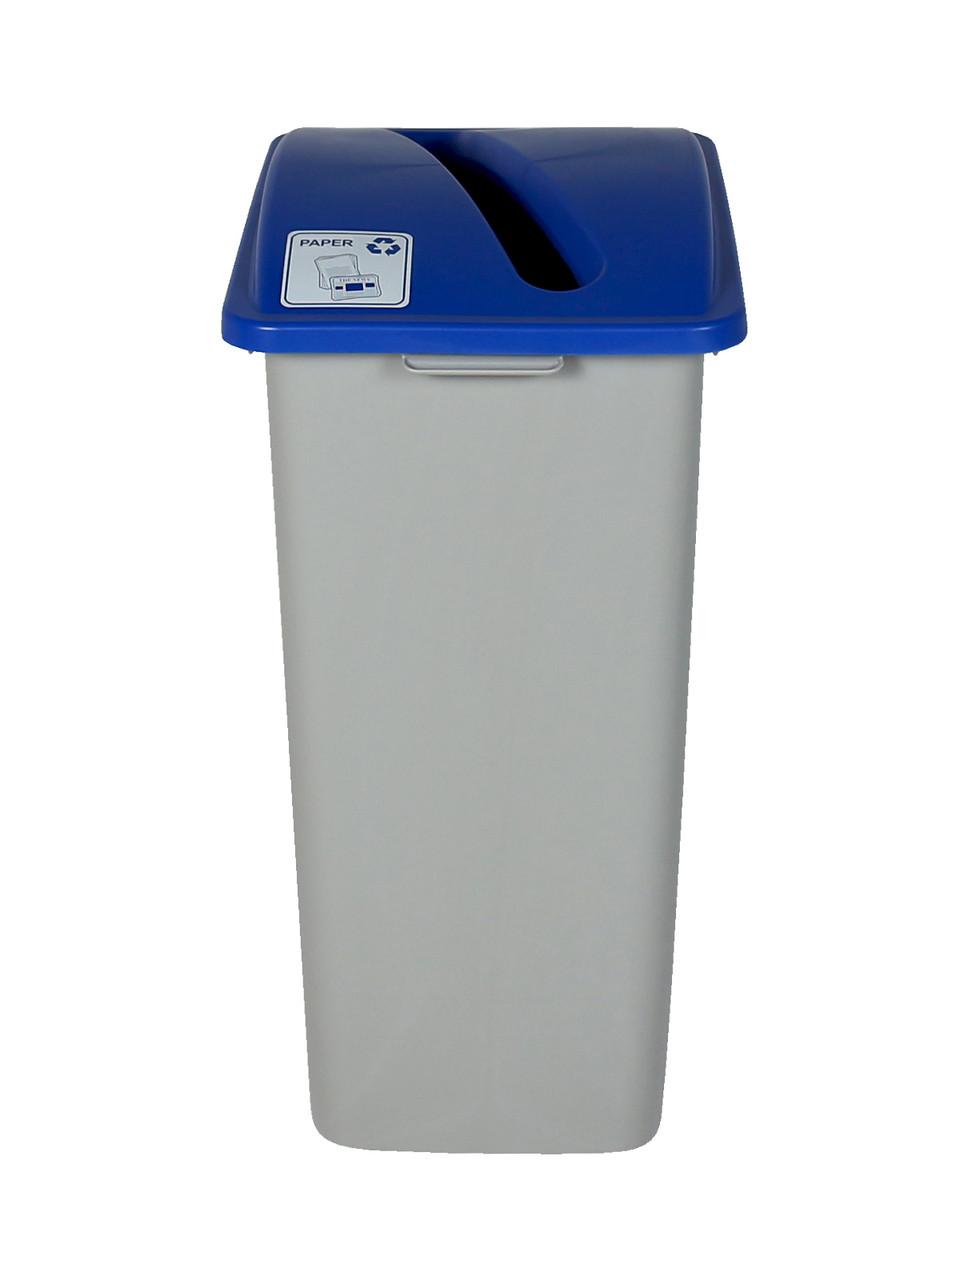 32 Gallon XL Simple Sort Recycling Bin Blue Lid